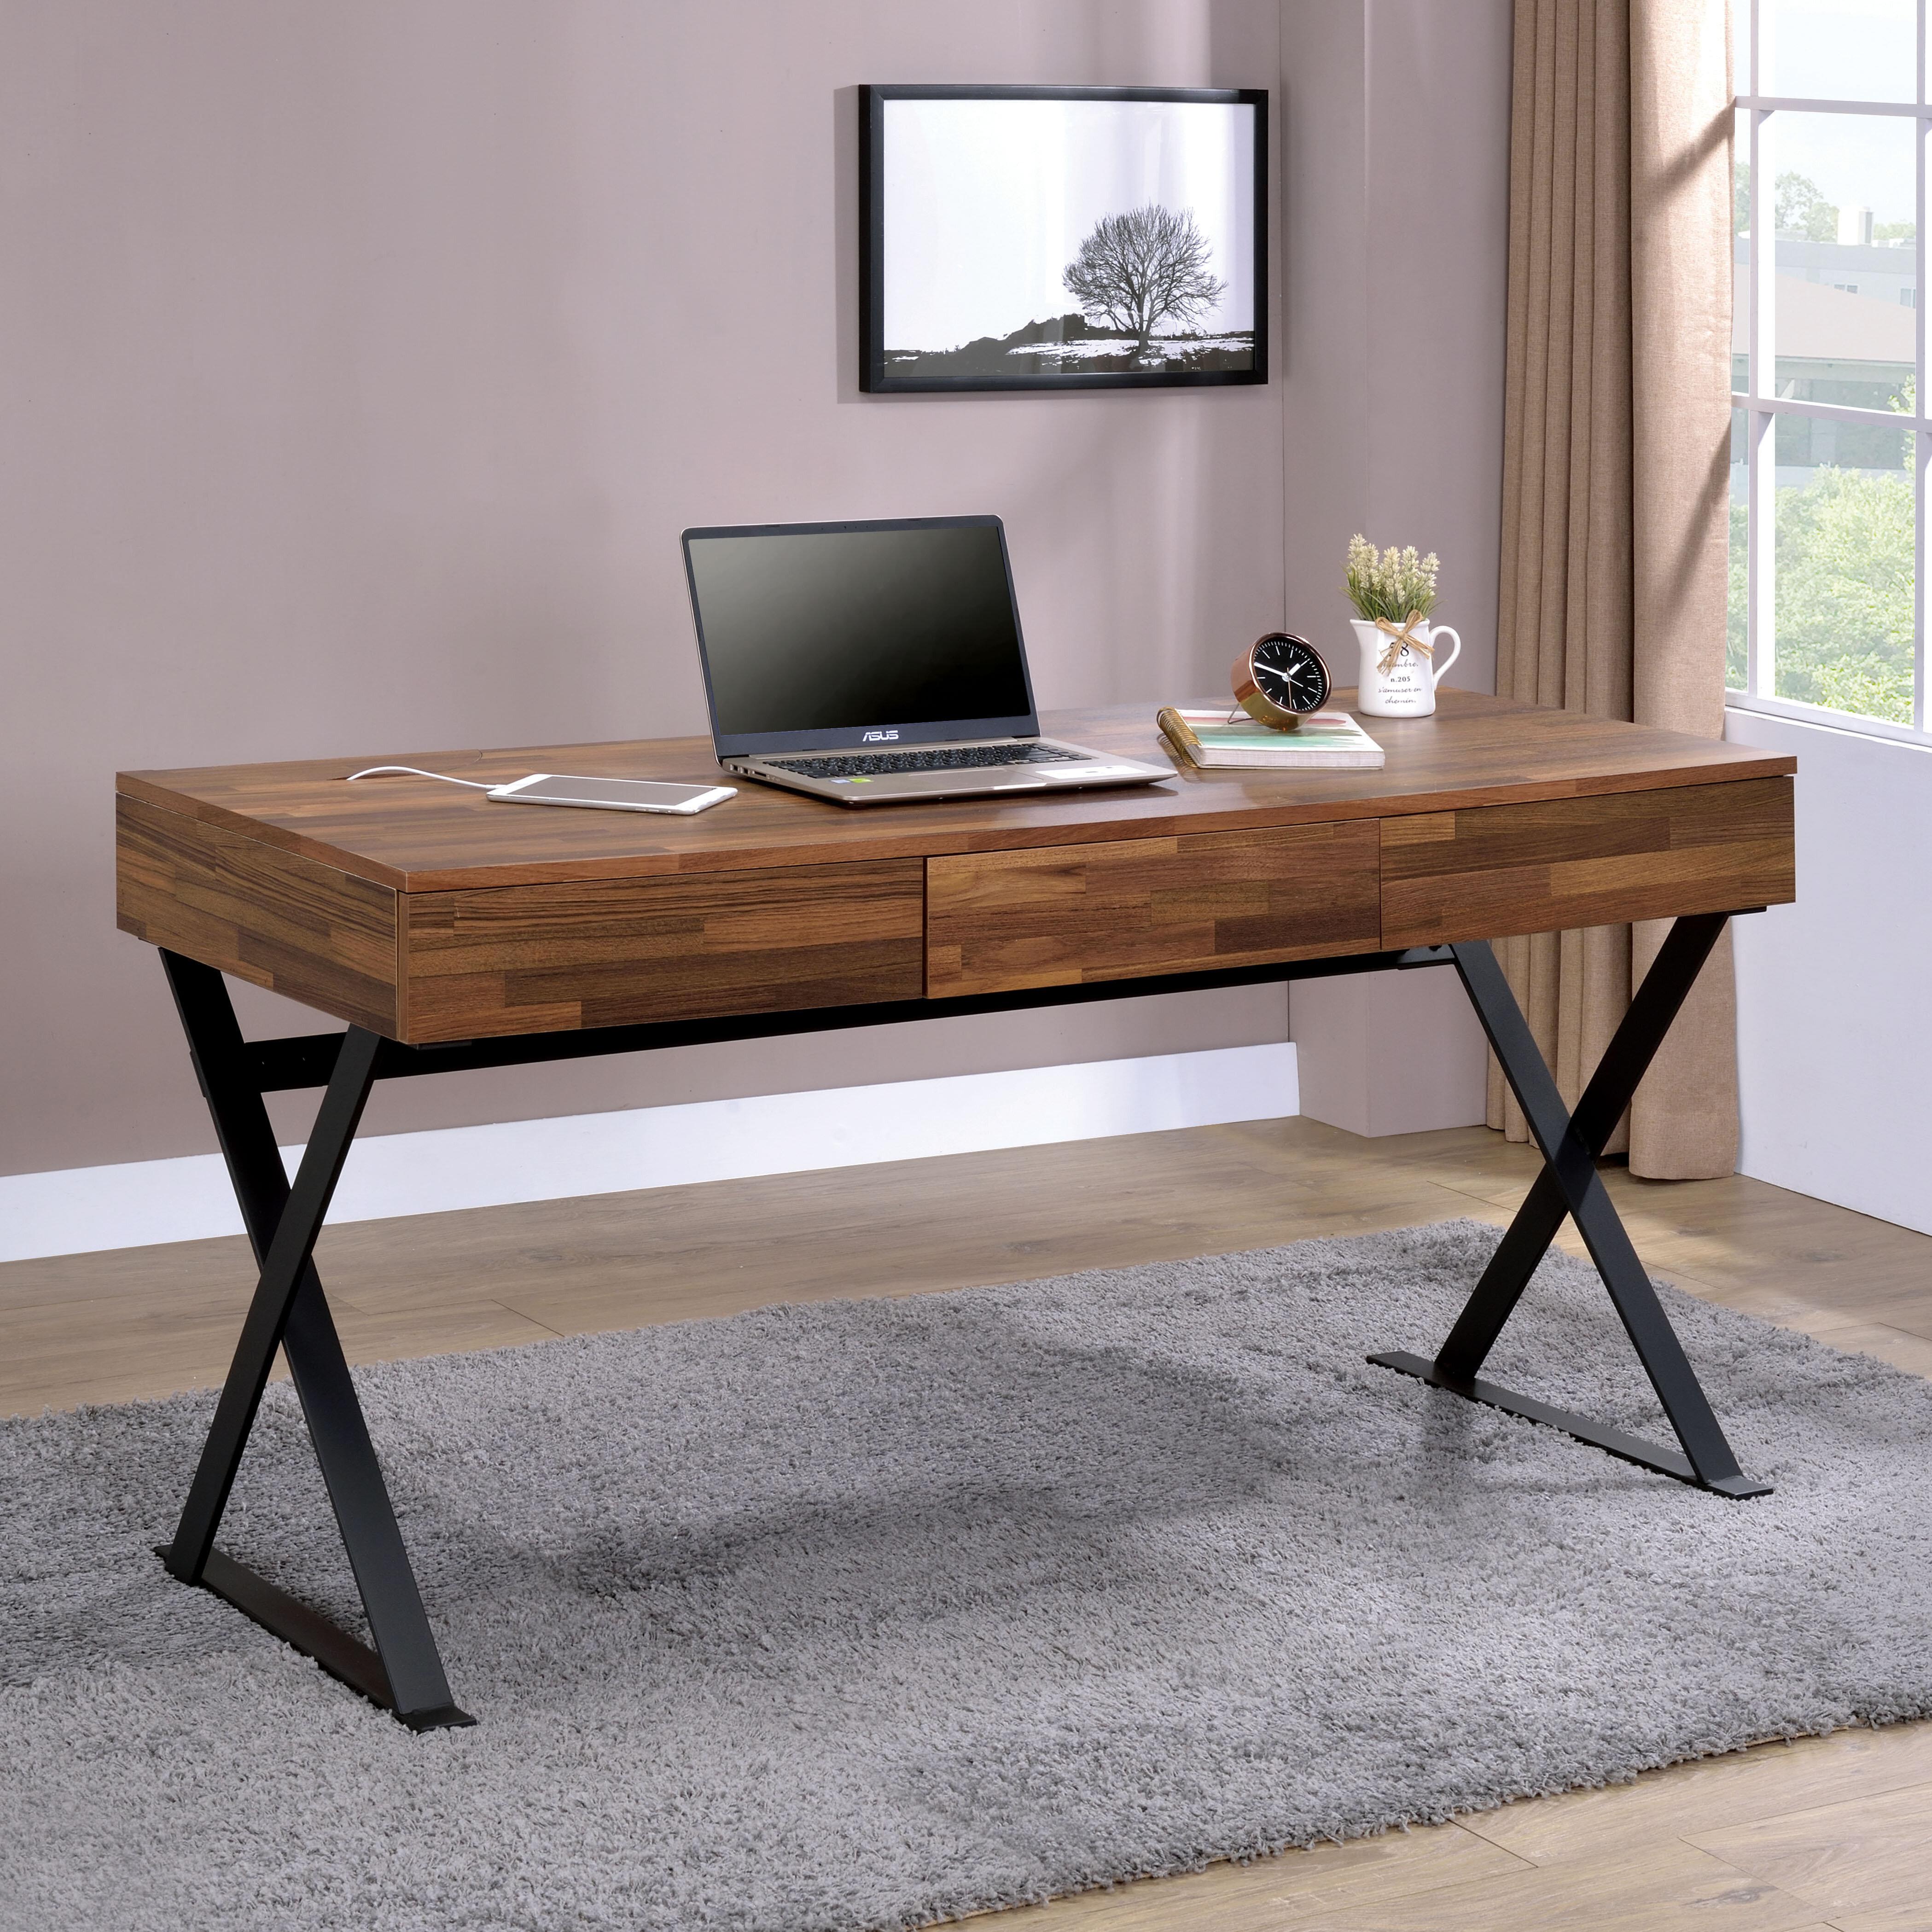 Williston Forge Bodnar 3 Drawer Computer Desk & Reviews | Wayfair